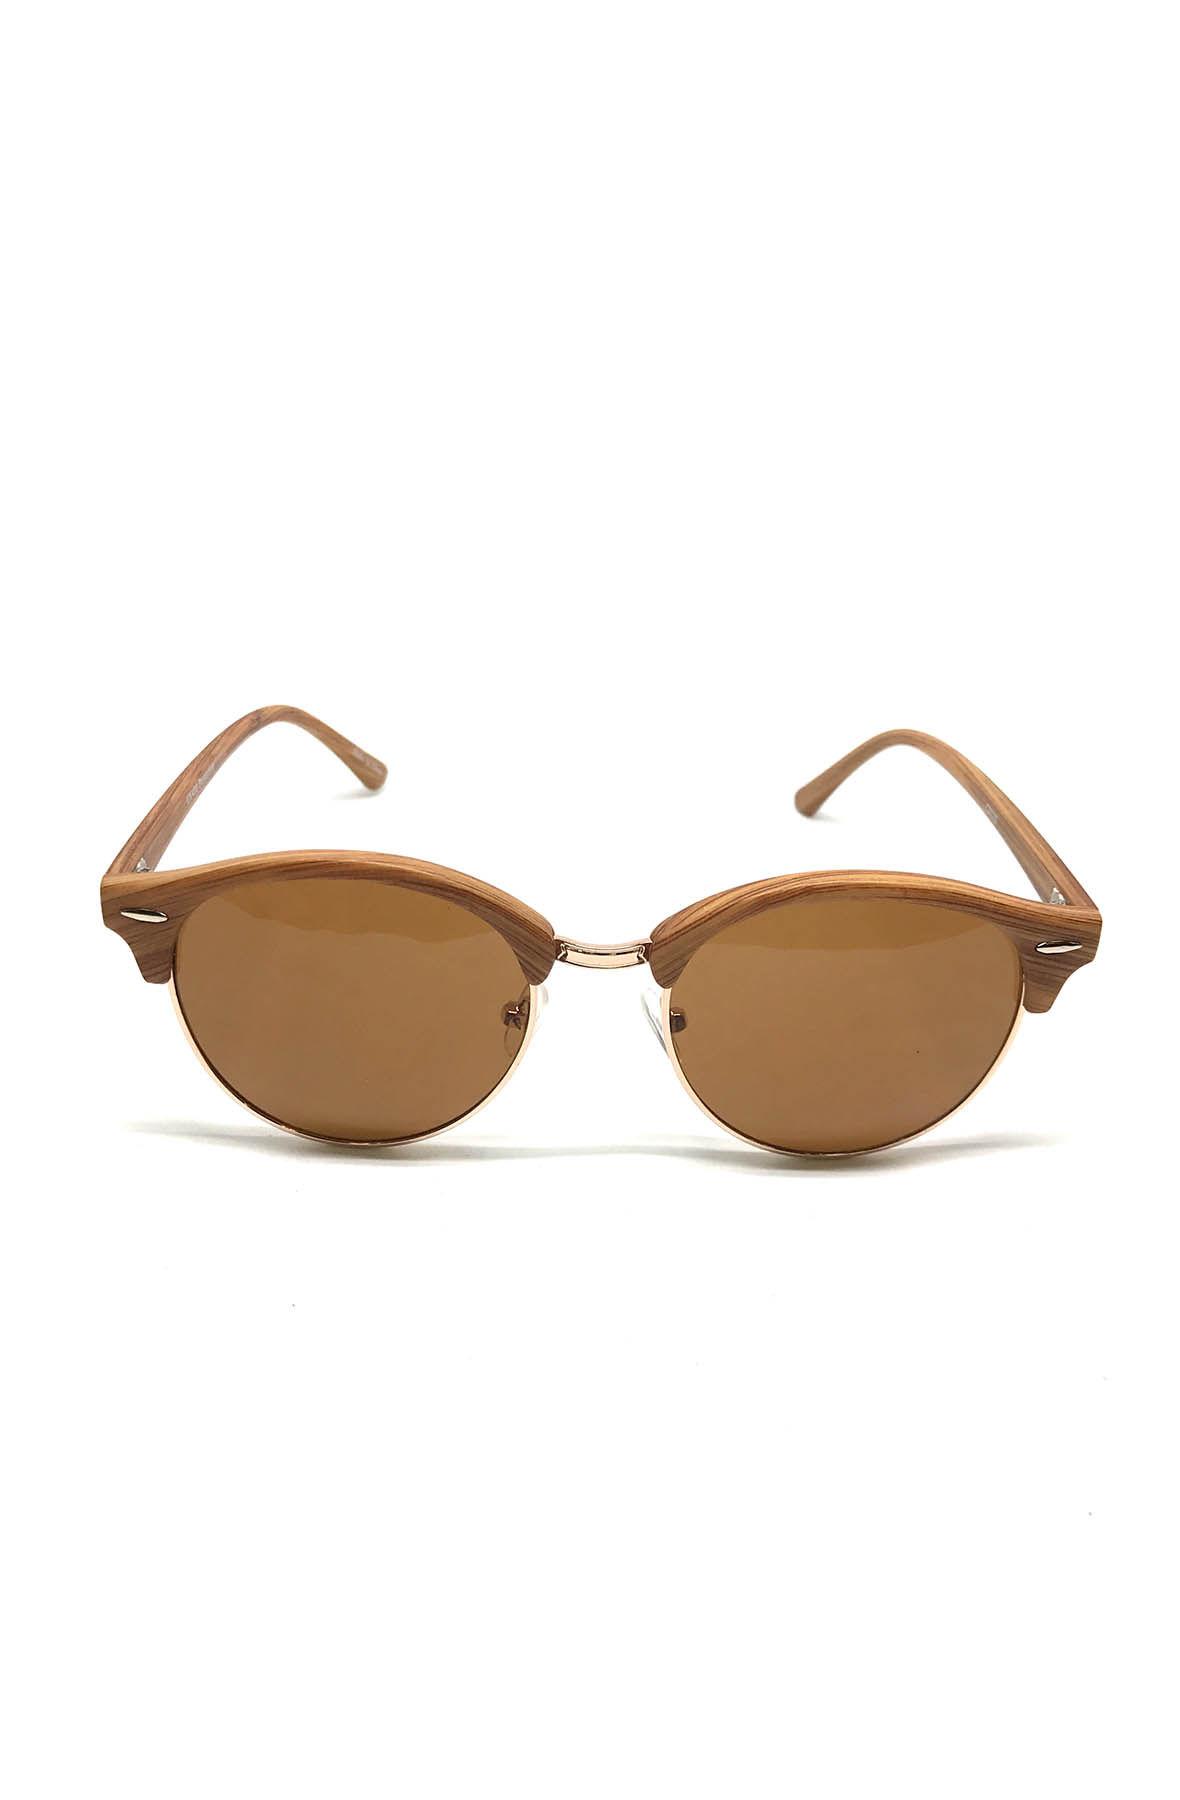 Stan Sunglasses in Tan